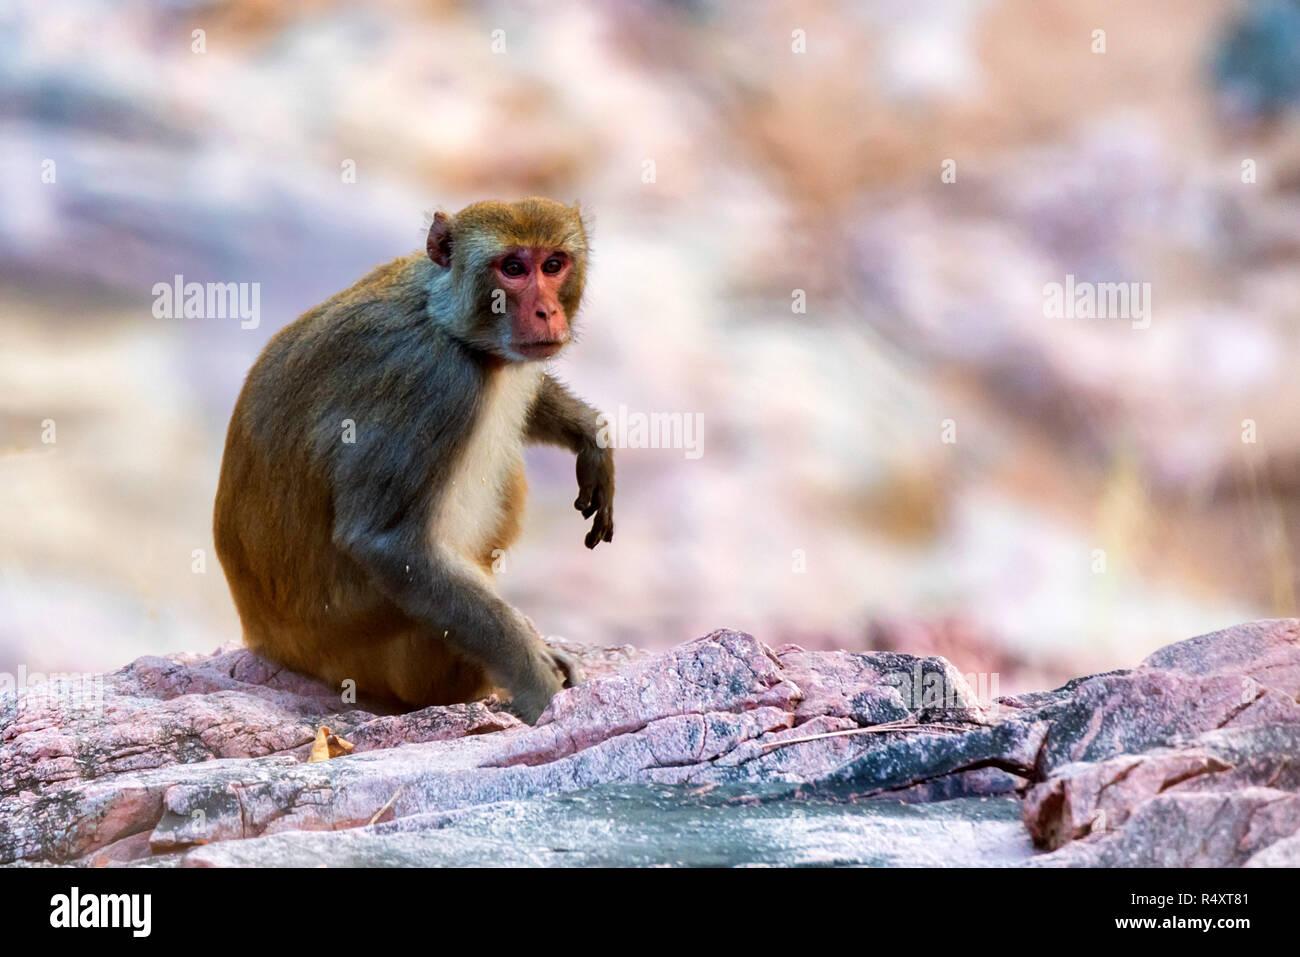 Sri-Lankan toque macaque or Macaca sinica in nature - Stock Image